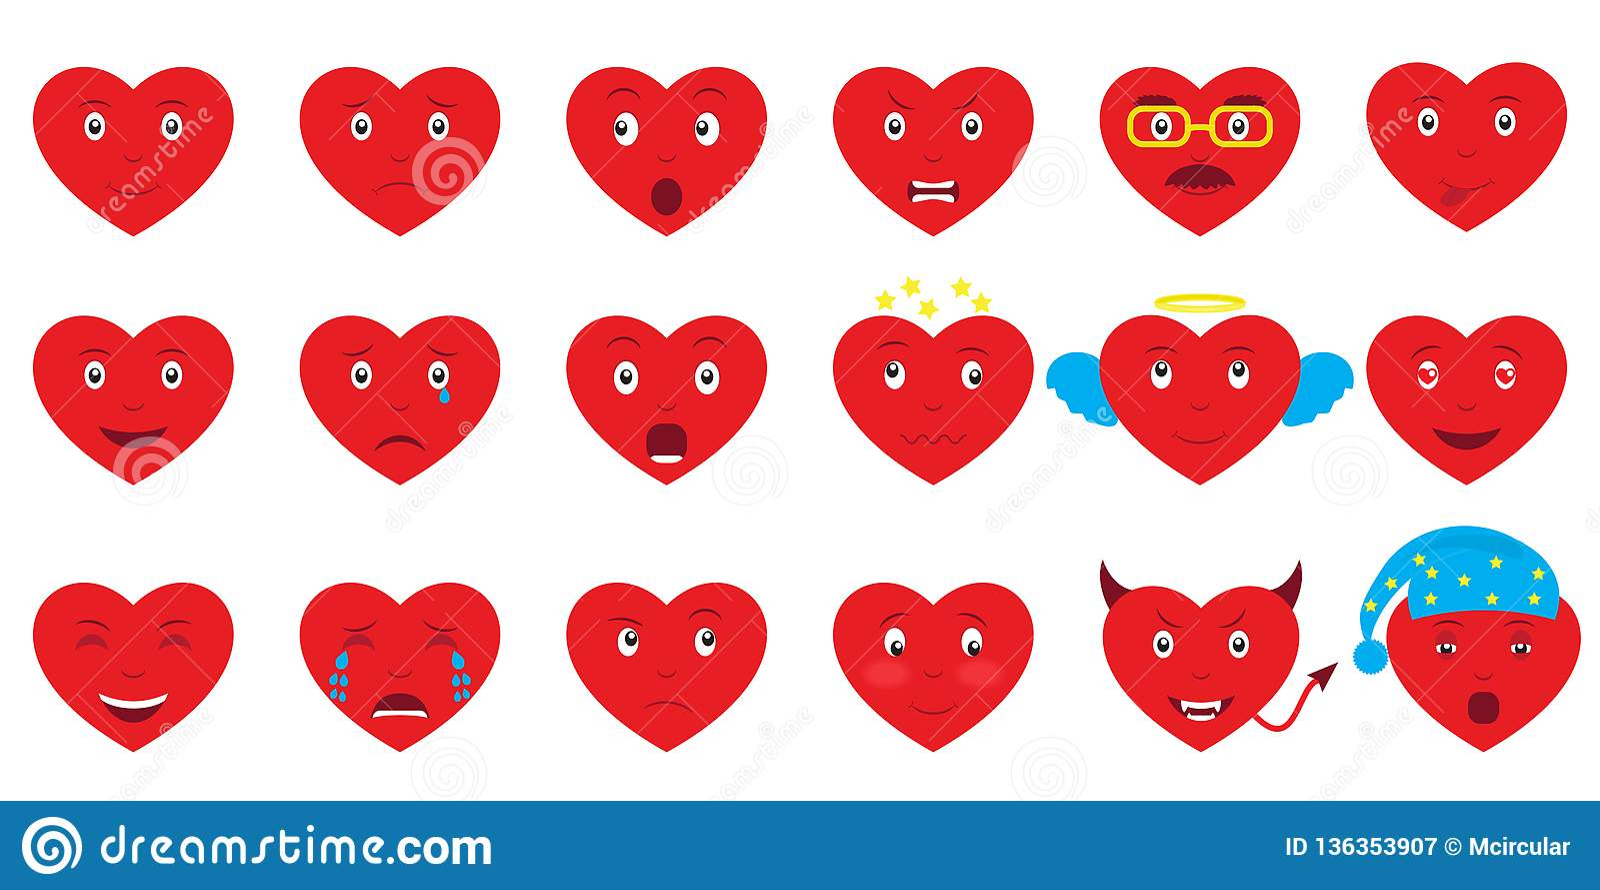 Set of 18 hearts emoji. Design elements for Valentines Day